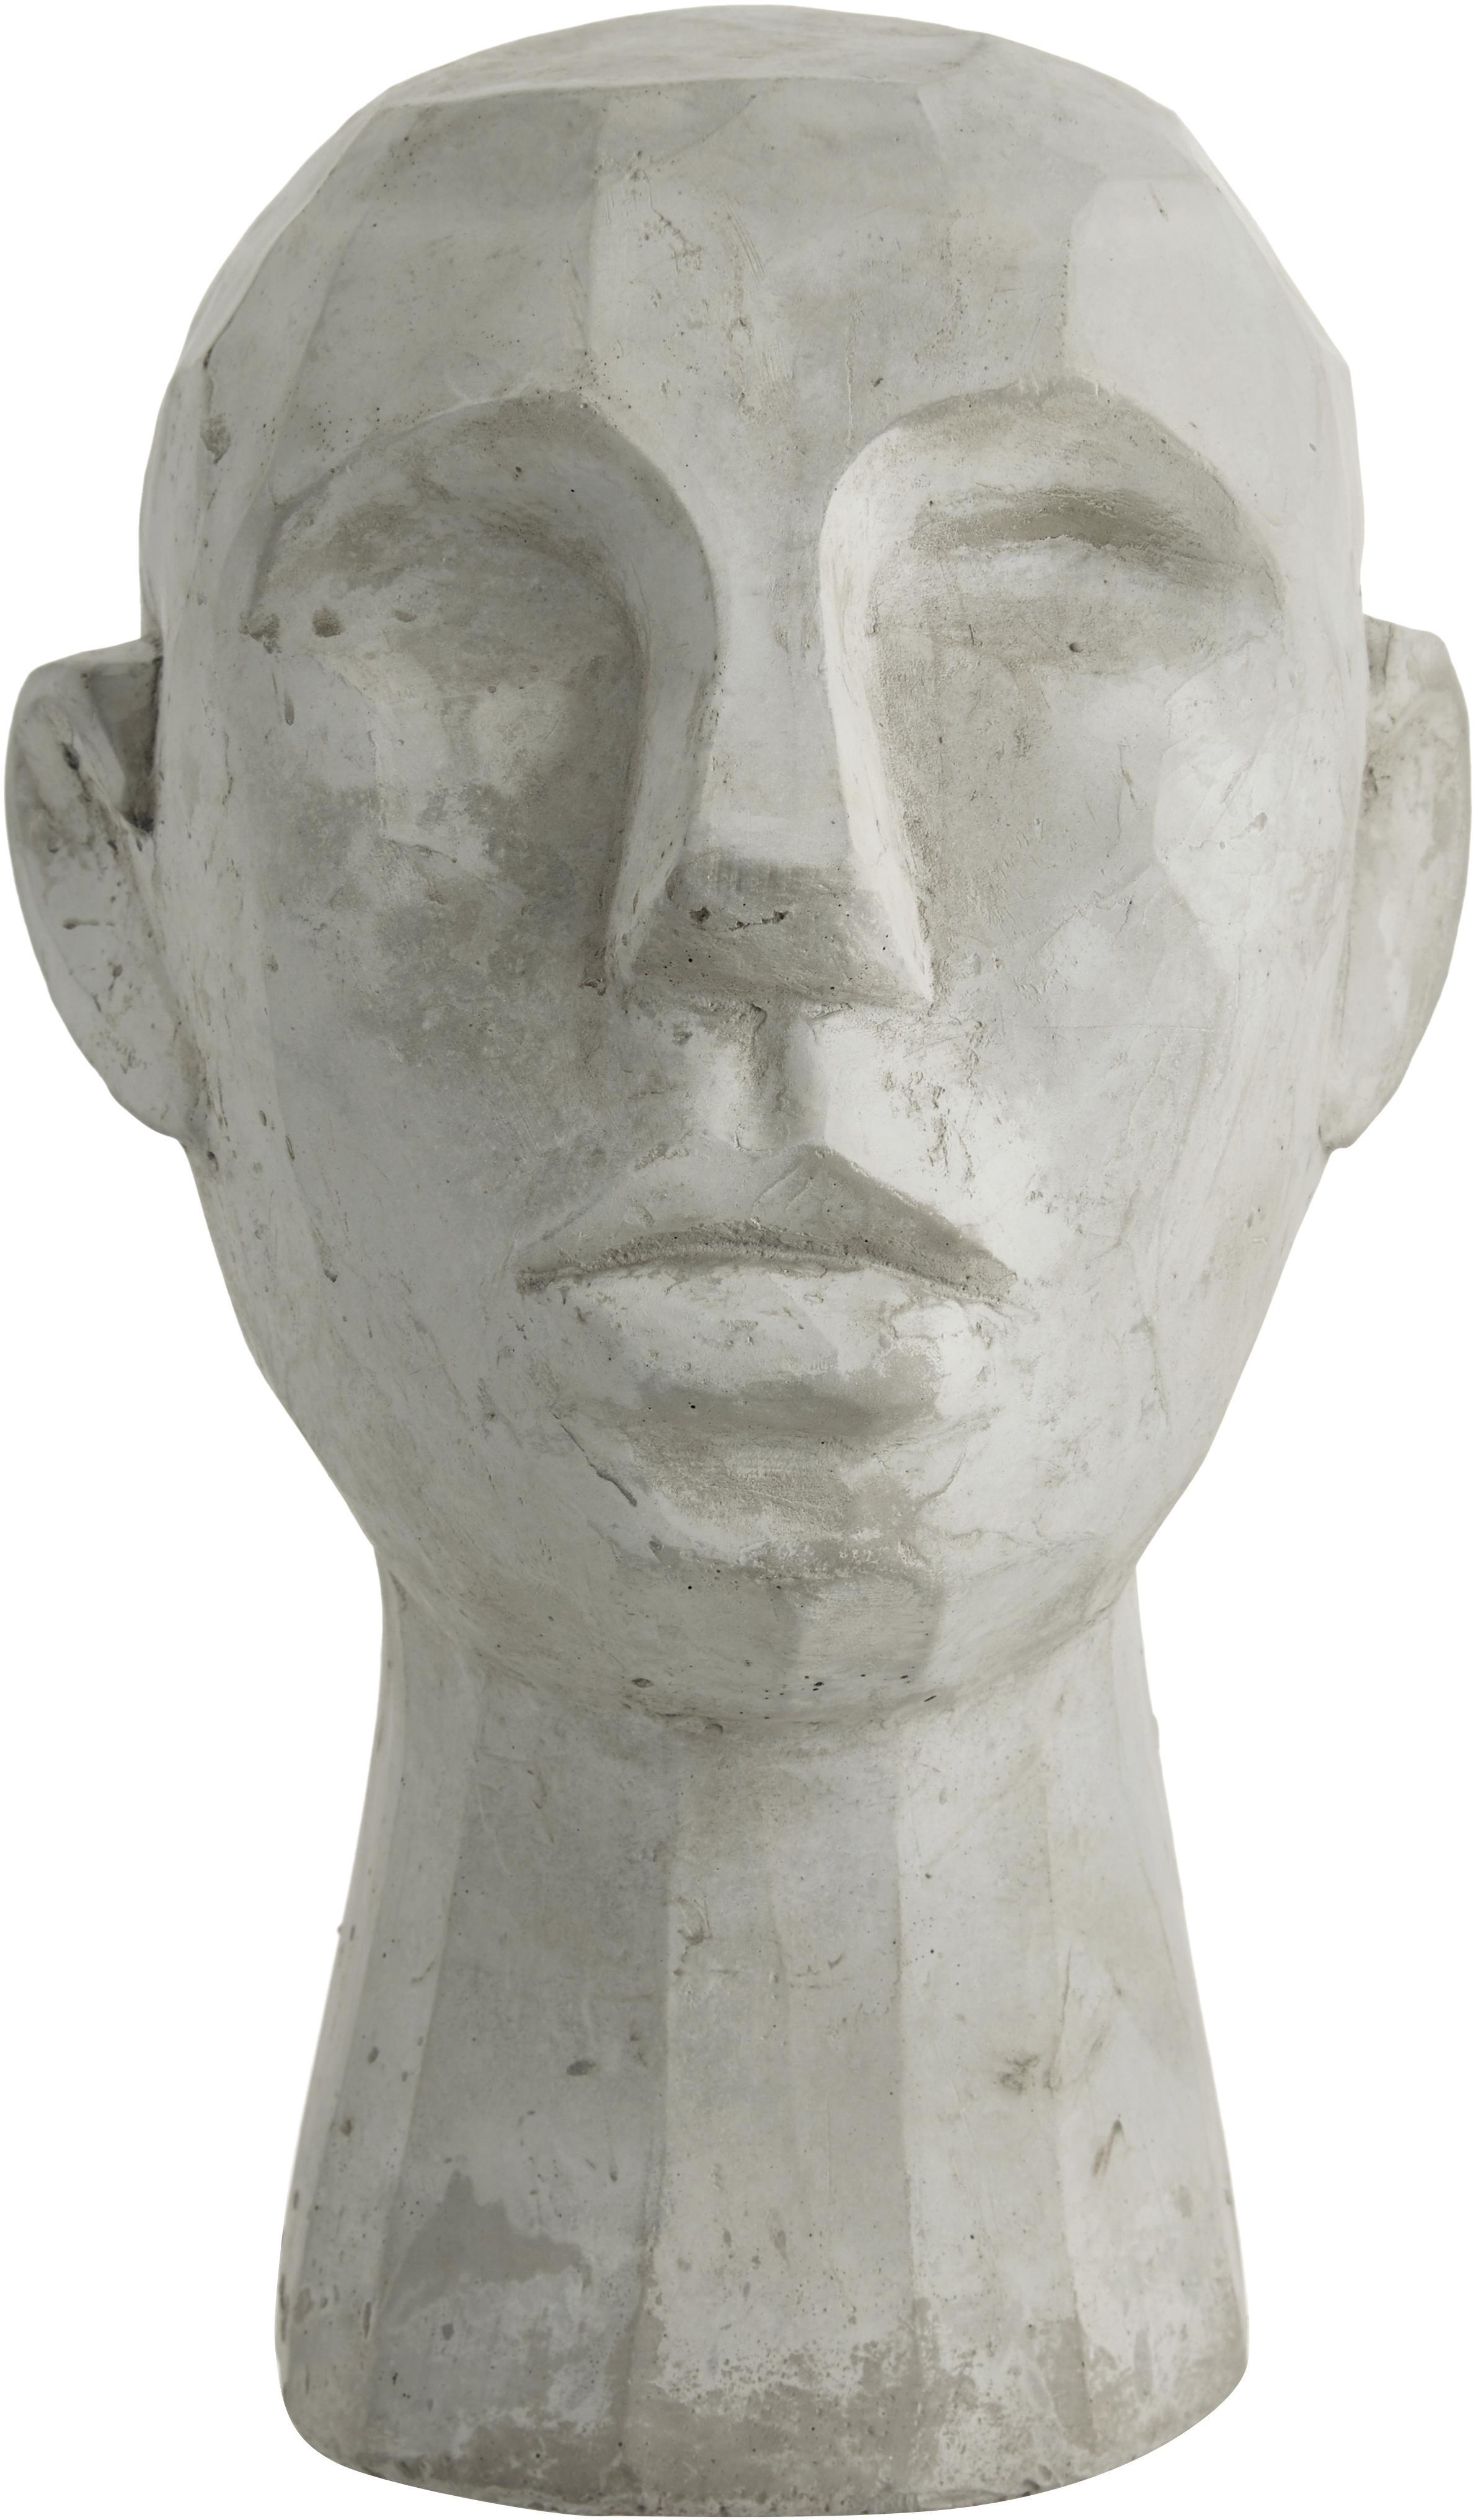 Deko-Objekt Kopf, Zement, Grau, 20 x 30 cm